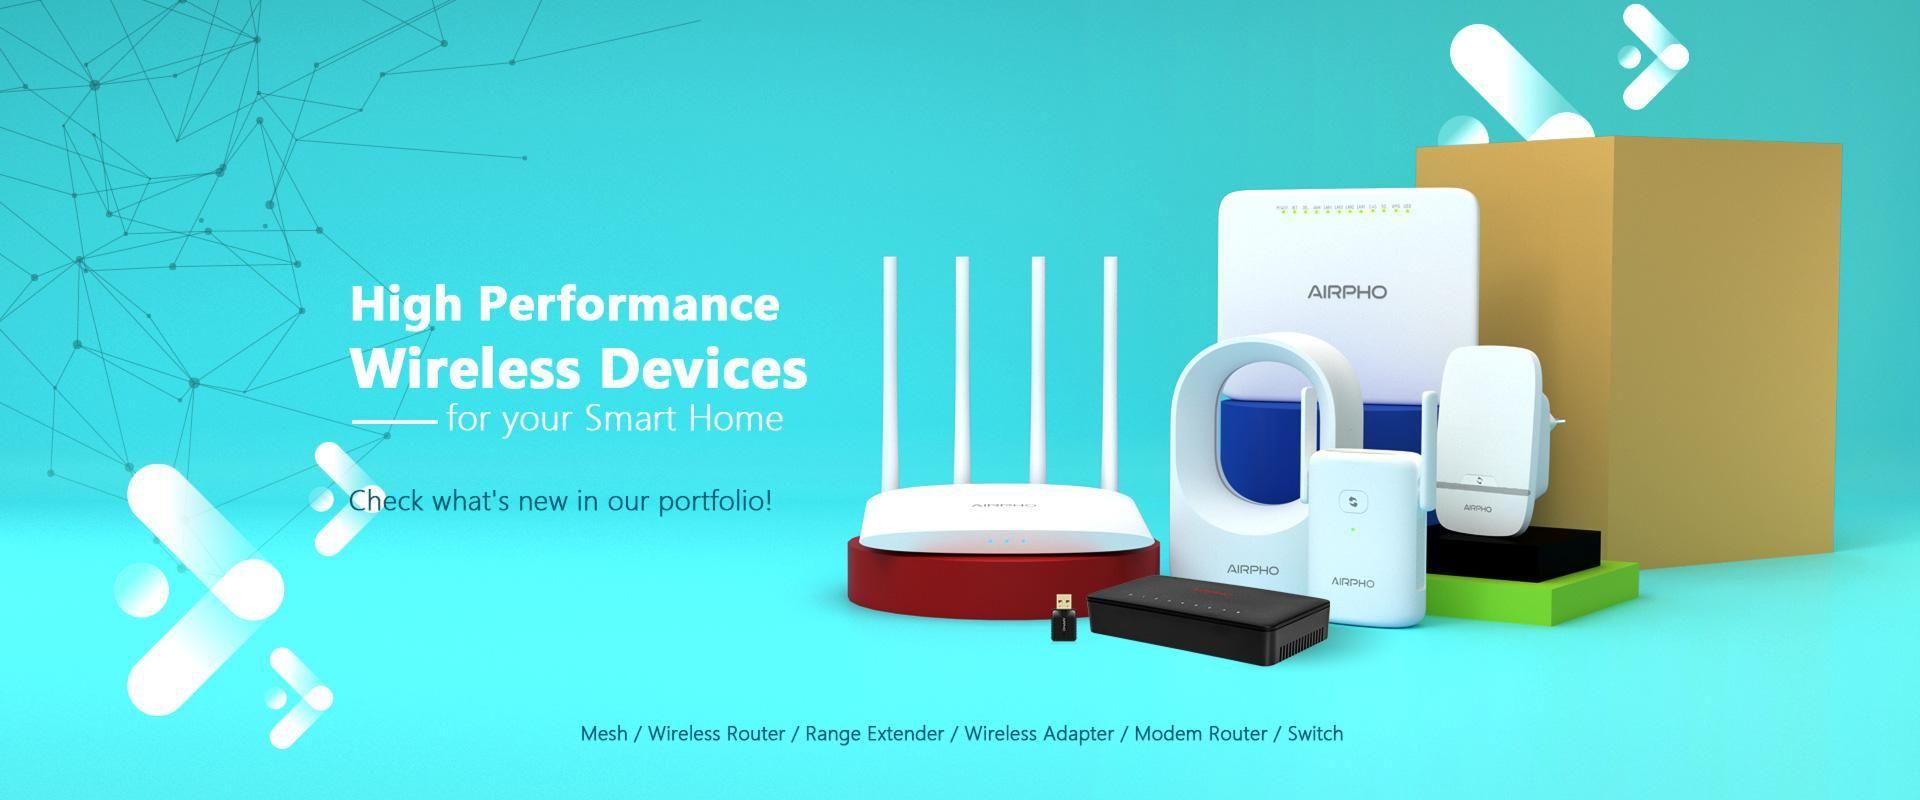 Airpho Technology Co., Ltd